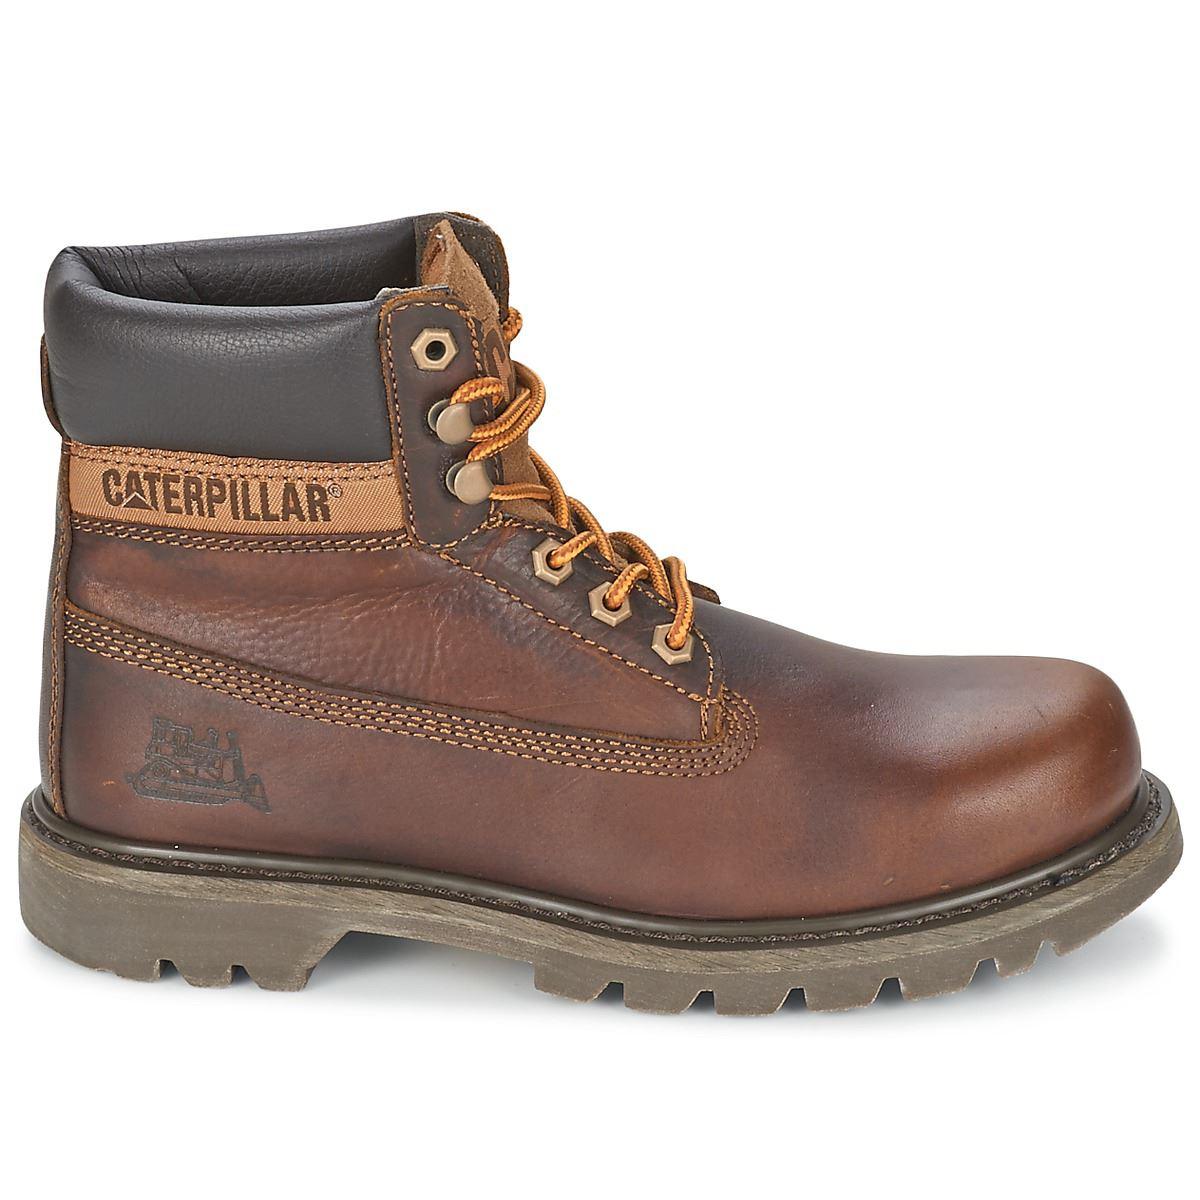 Amazon Caterpillar Mens Shoes